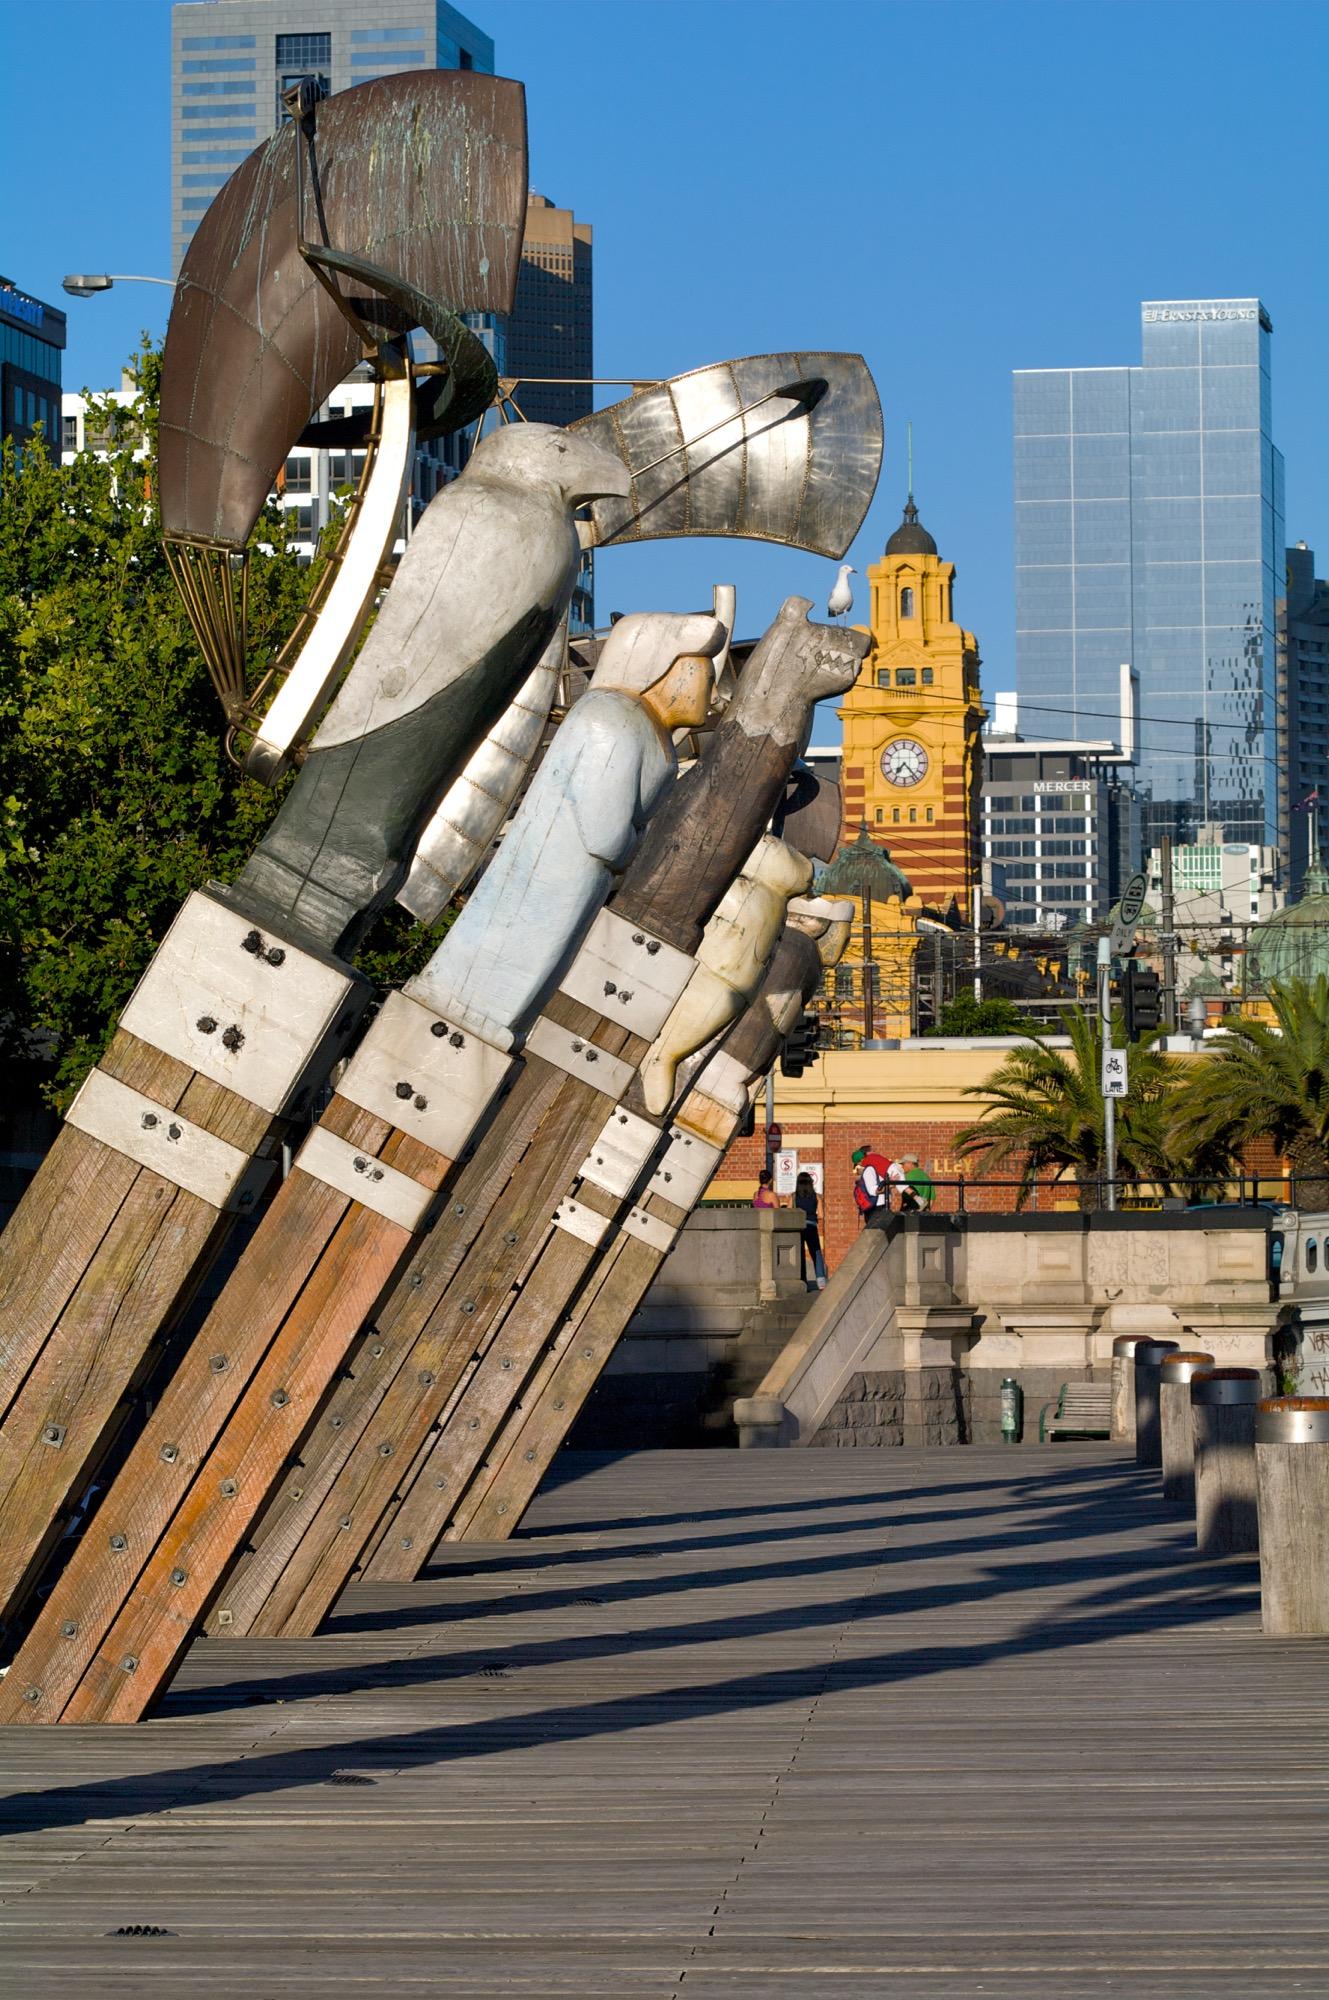 Melbourne stuff - 1 of 223 (53).jpg